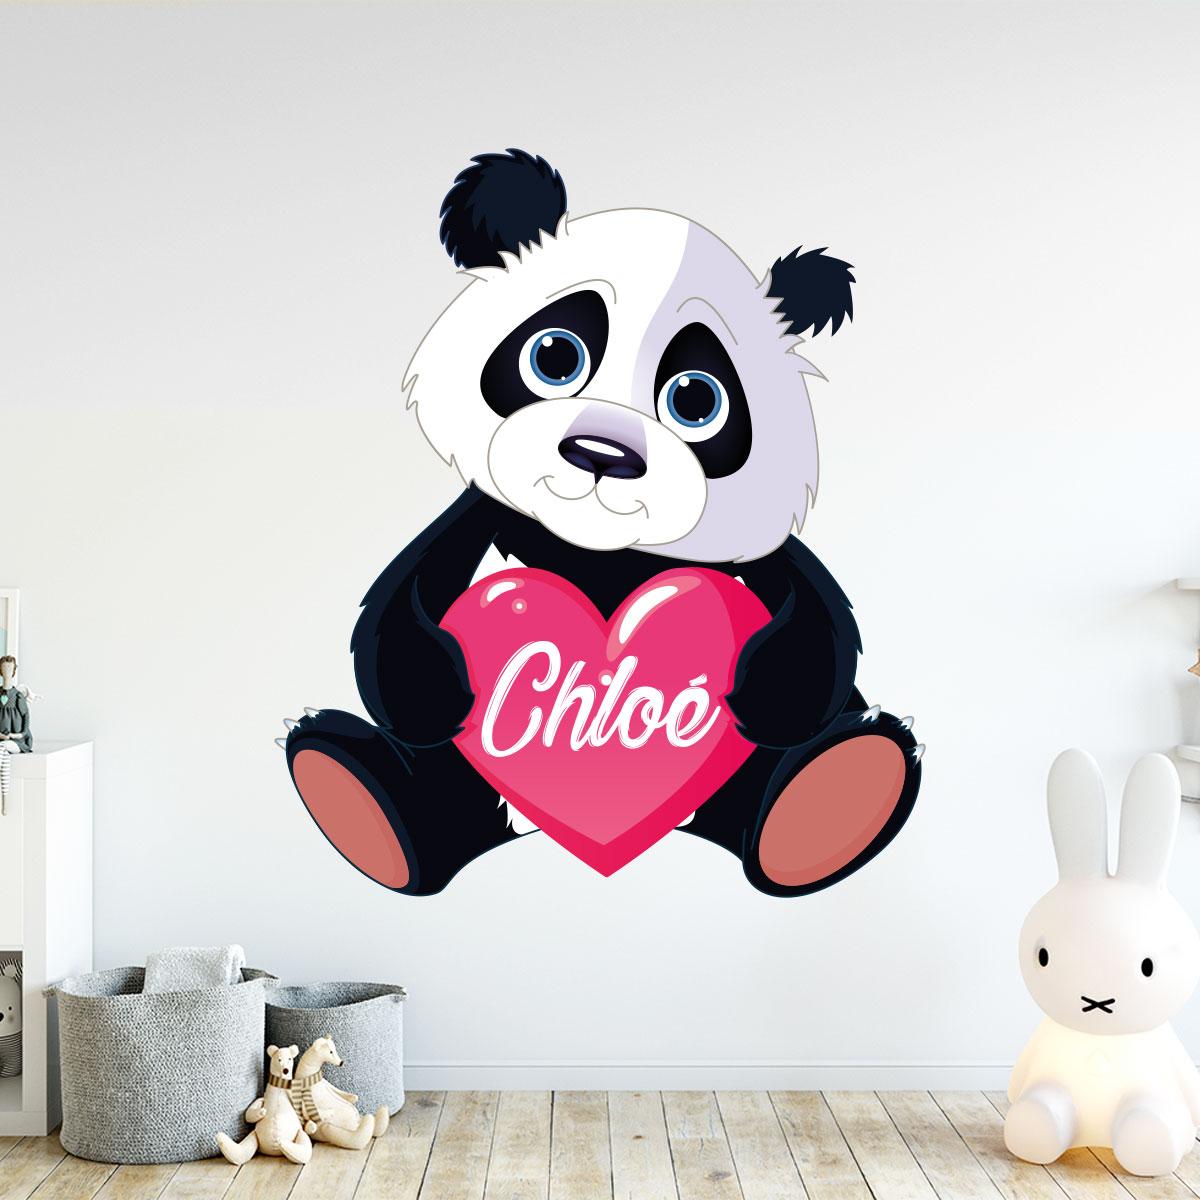 Sticker pr nom personnalis panda amoureux stickers filles coeurs ambiance sticker - Stickers muraux personnalise ...